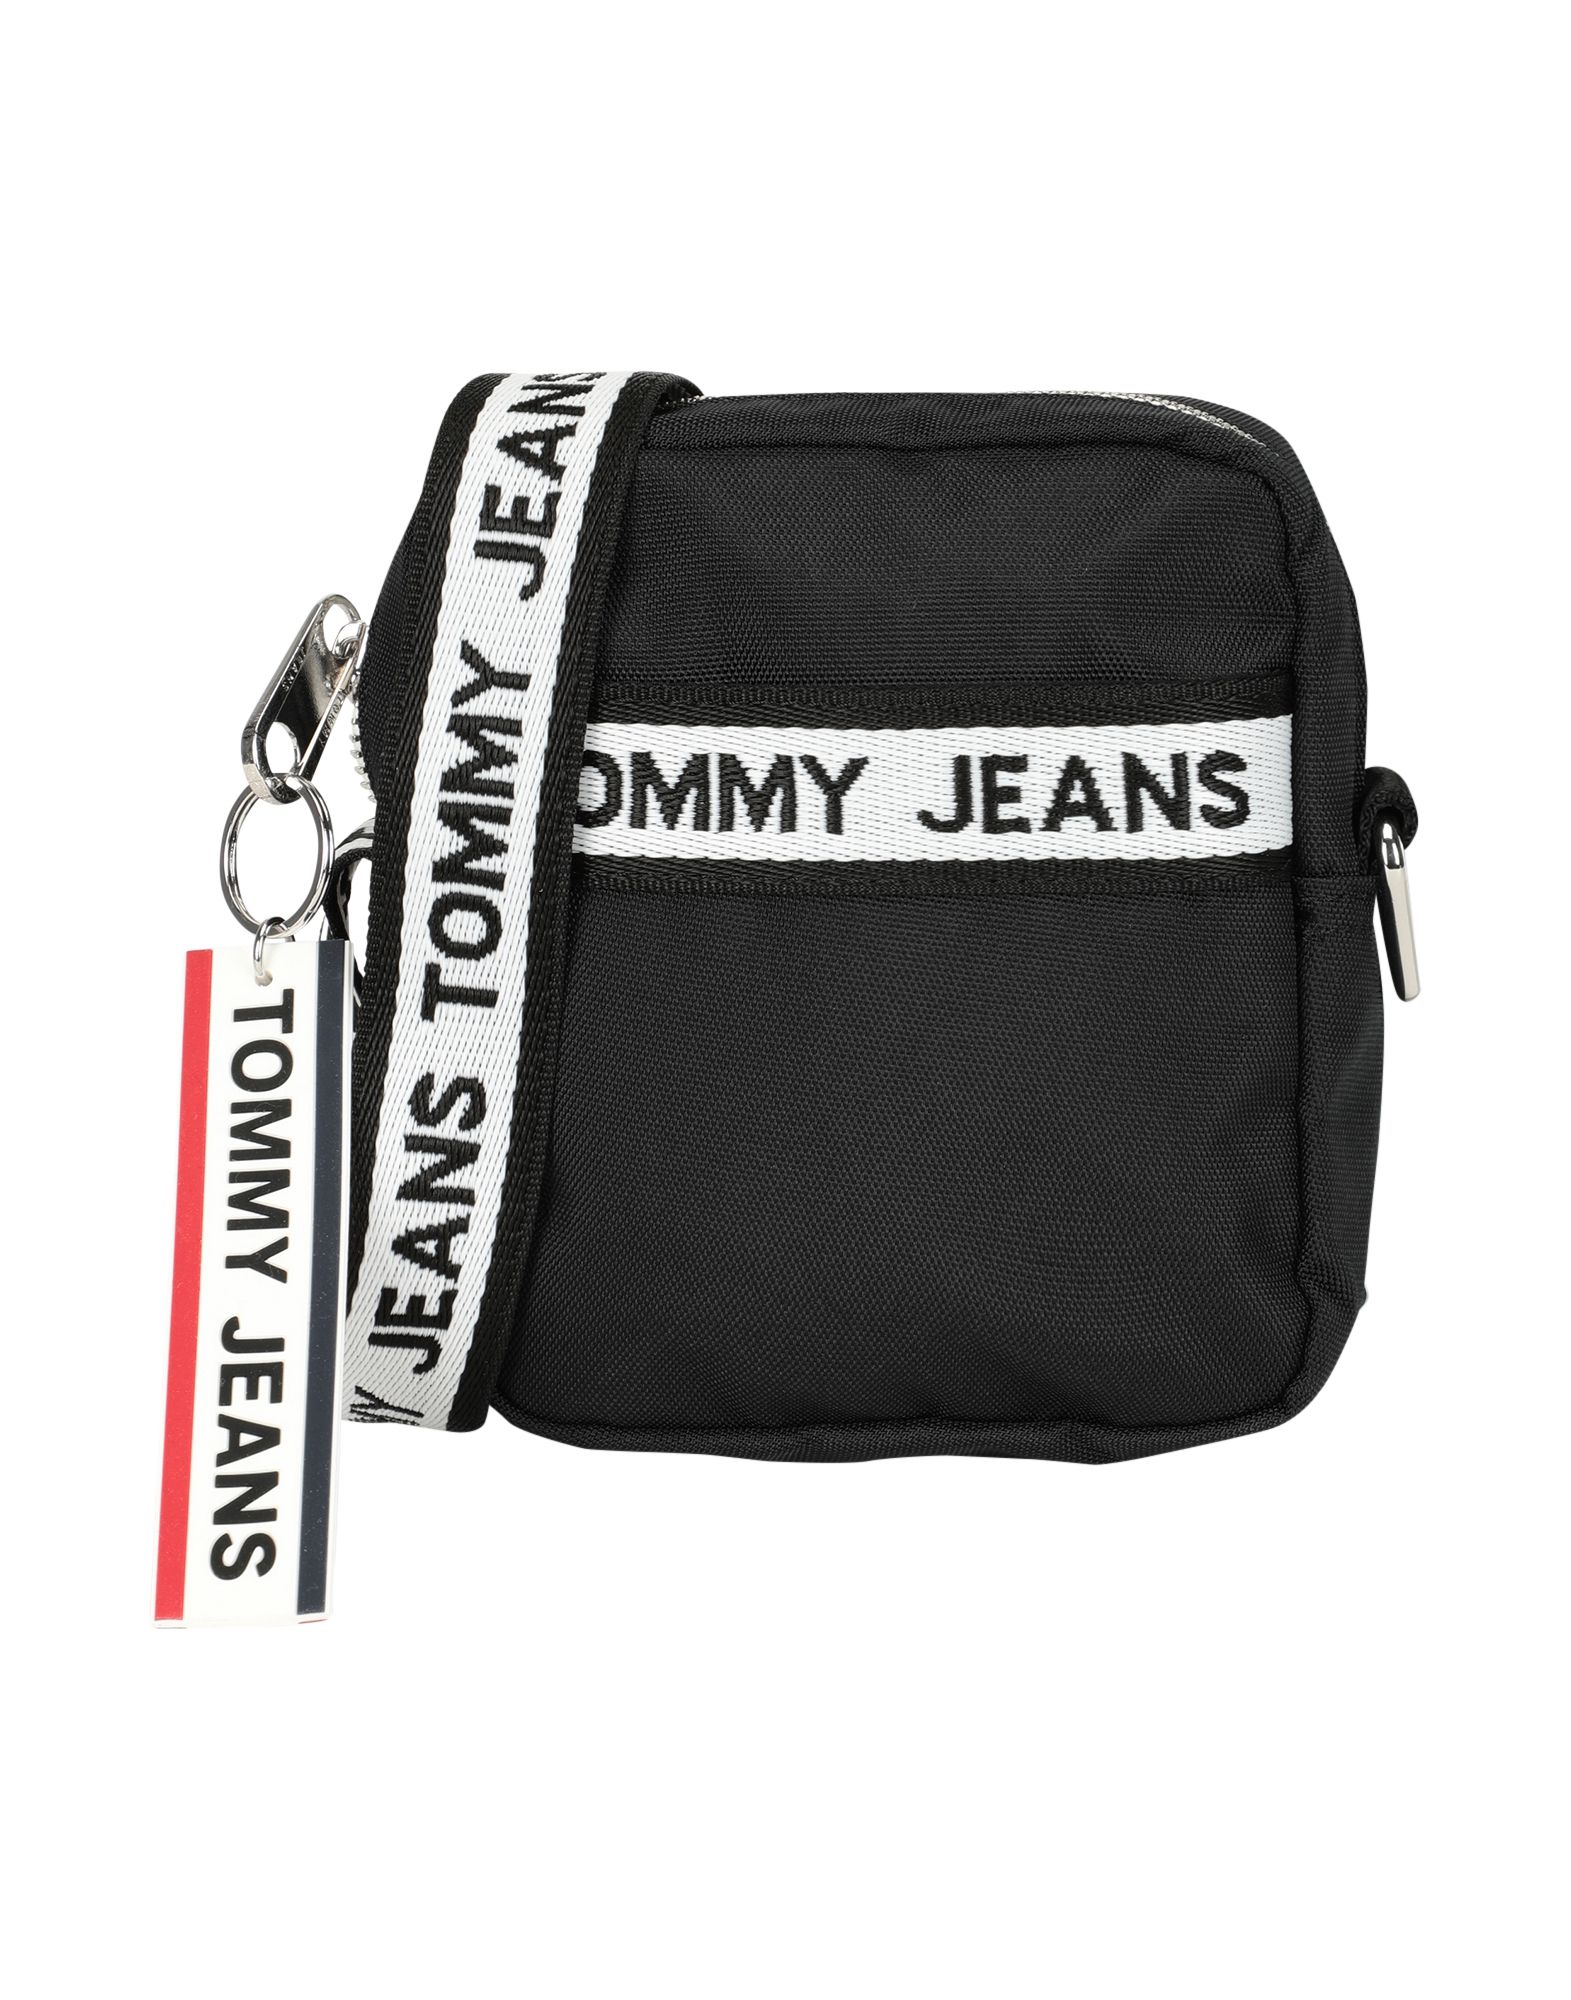 TOMMY JEANS Сумка через плечо tommy jeans сумка через плечо